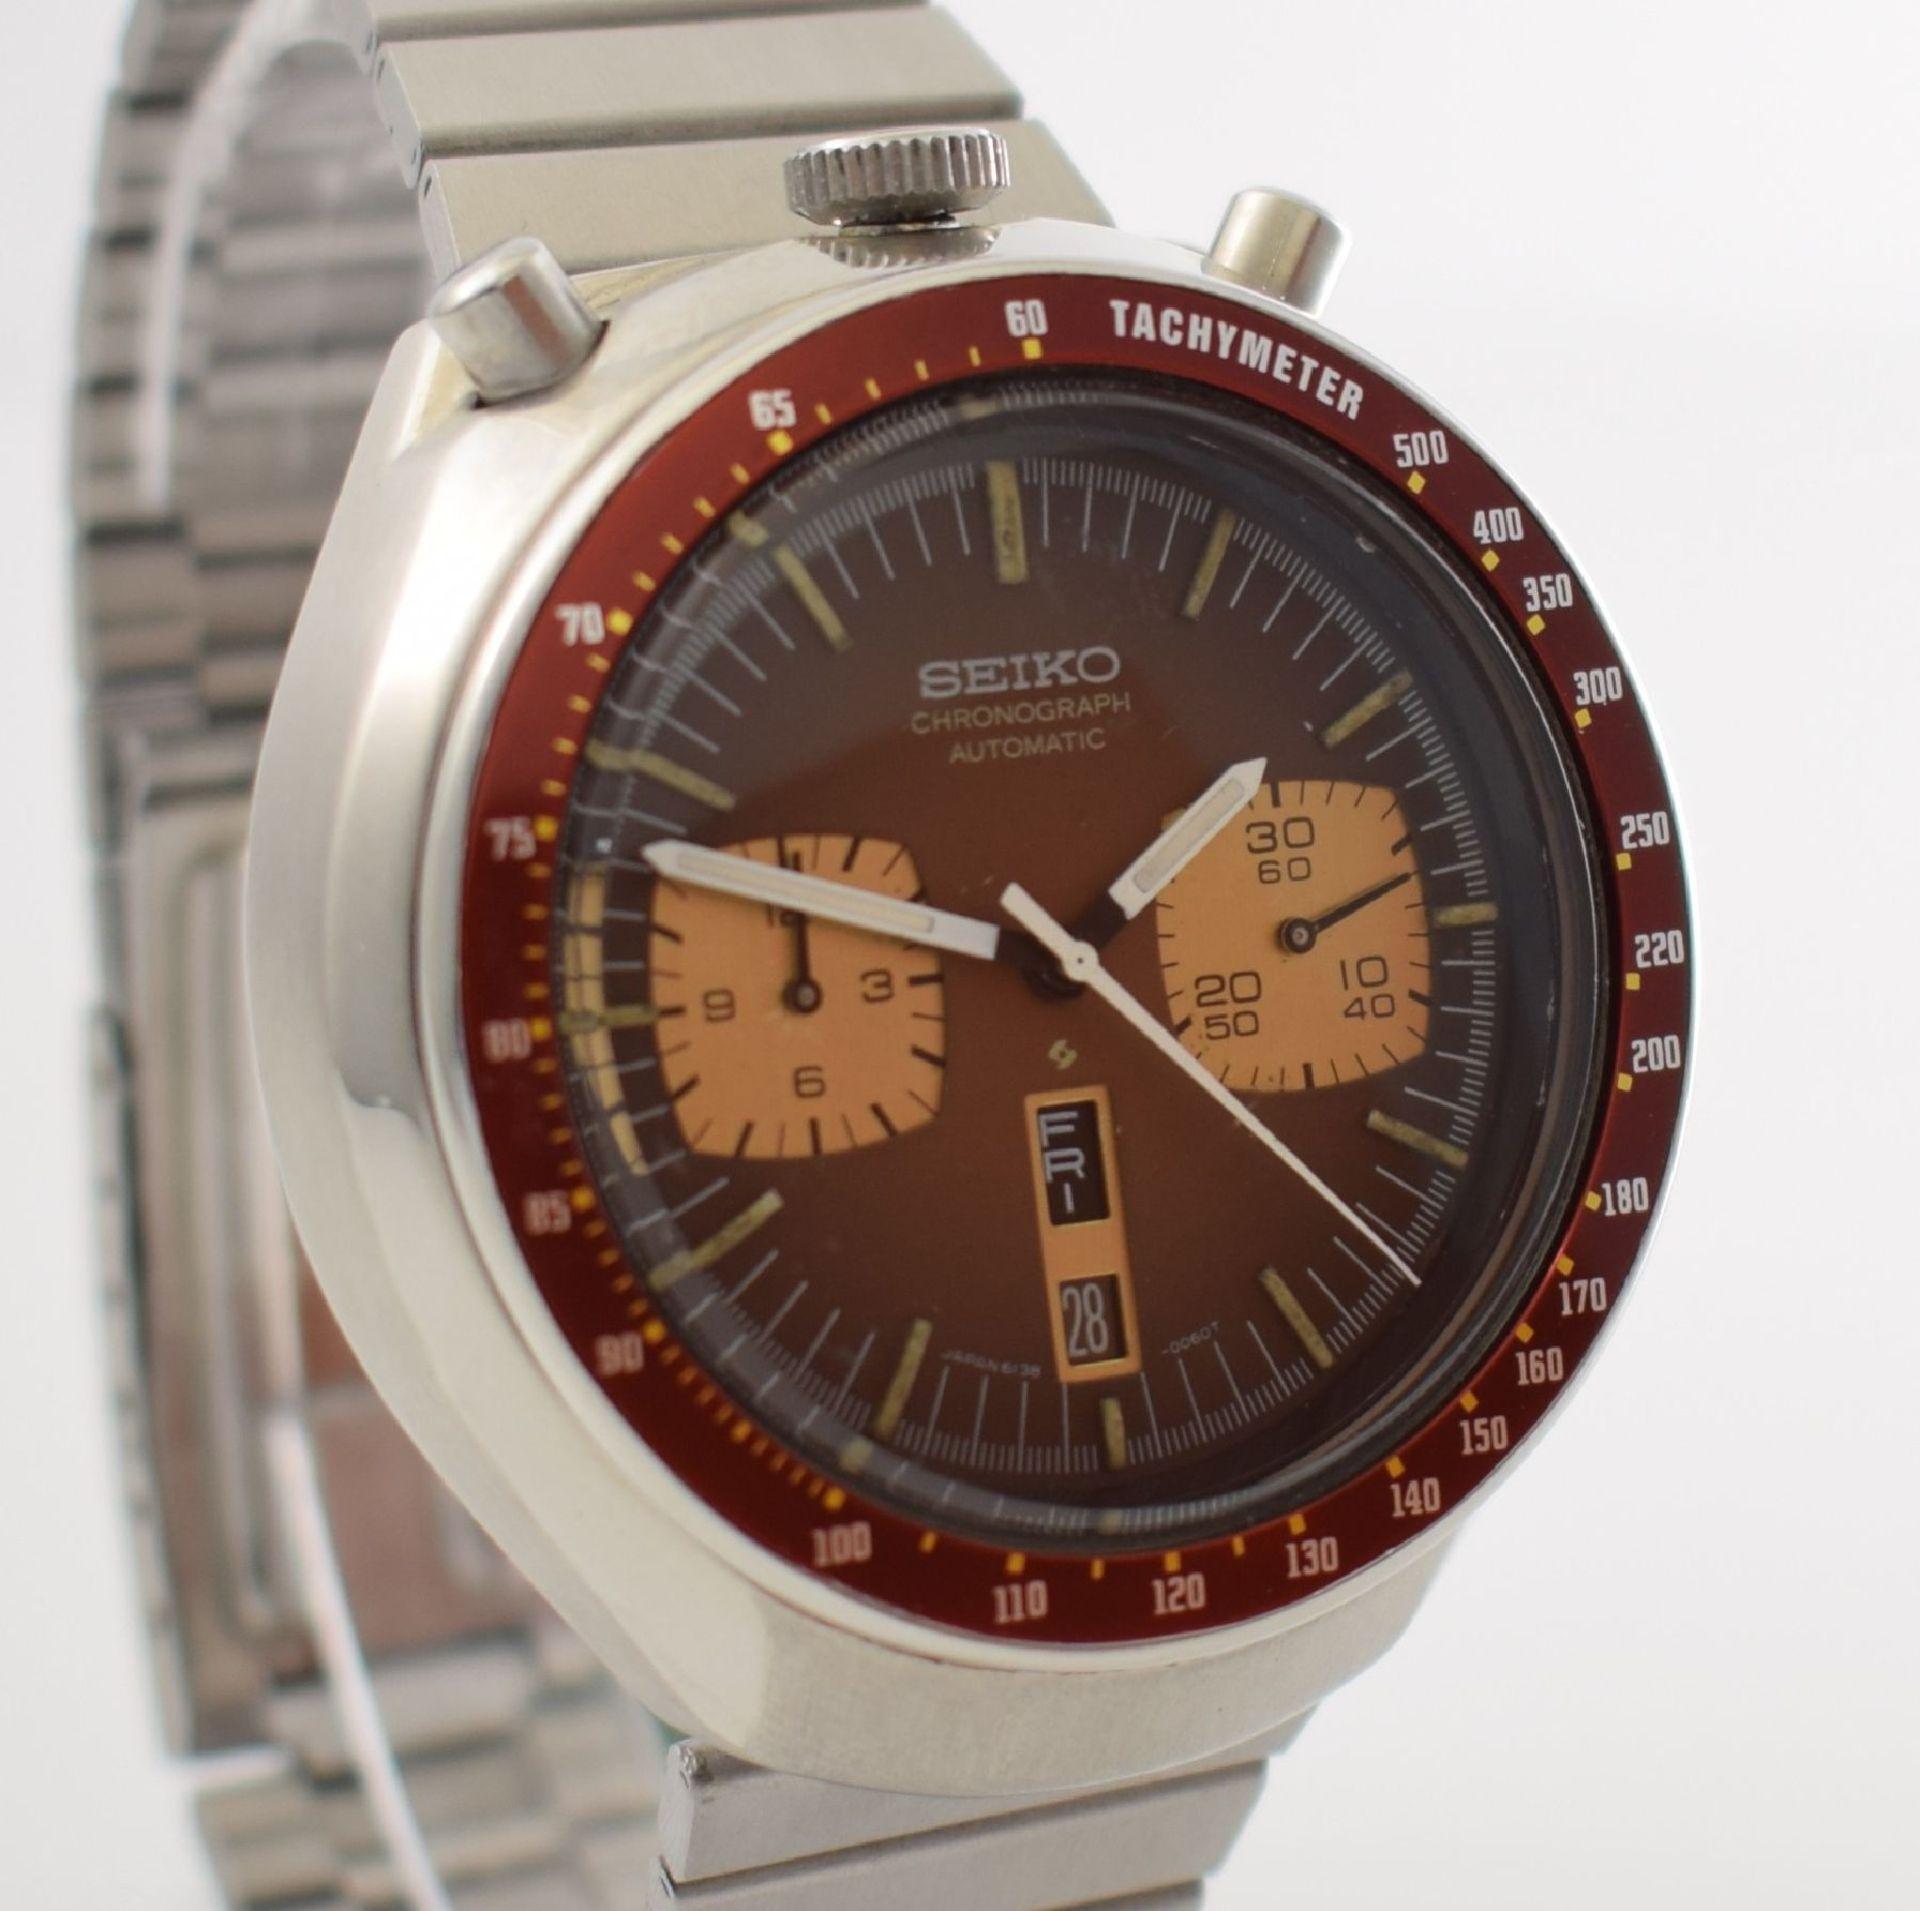 SEIKO sog. BULLHEAD Armbandchronograph, Japan um 1970, Automatik, Ref. 6138-0040, verschr. - Bild 6 aus 7